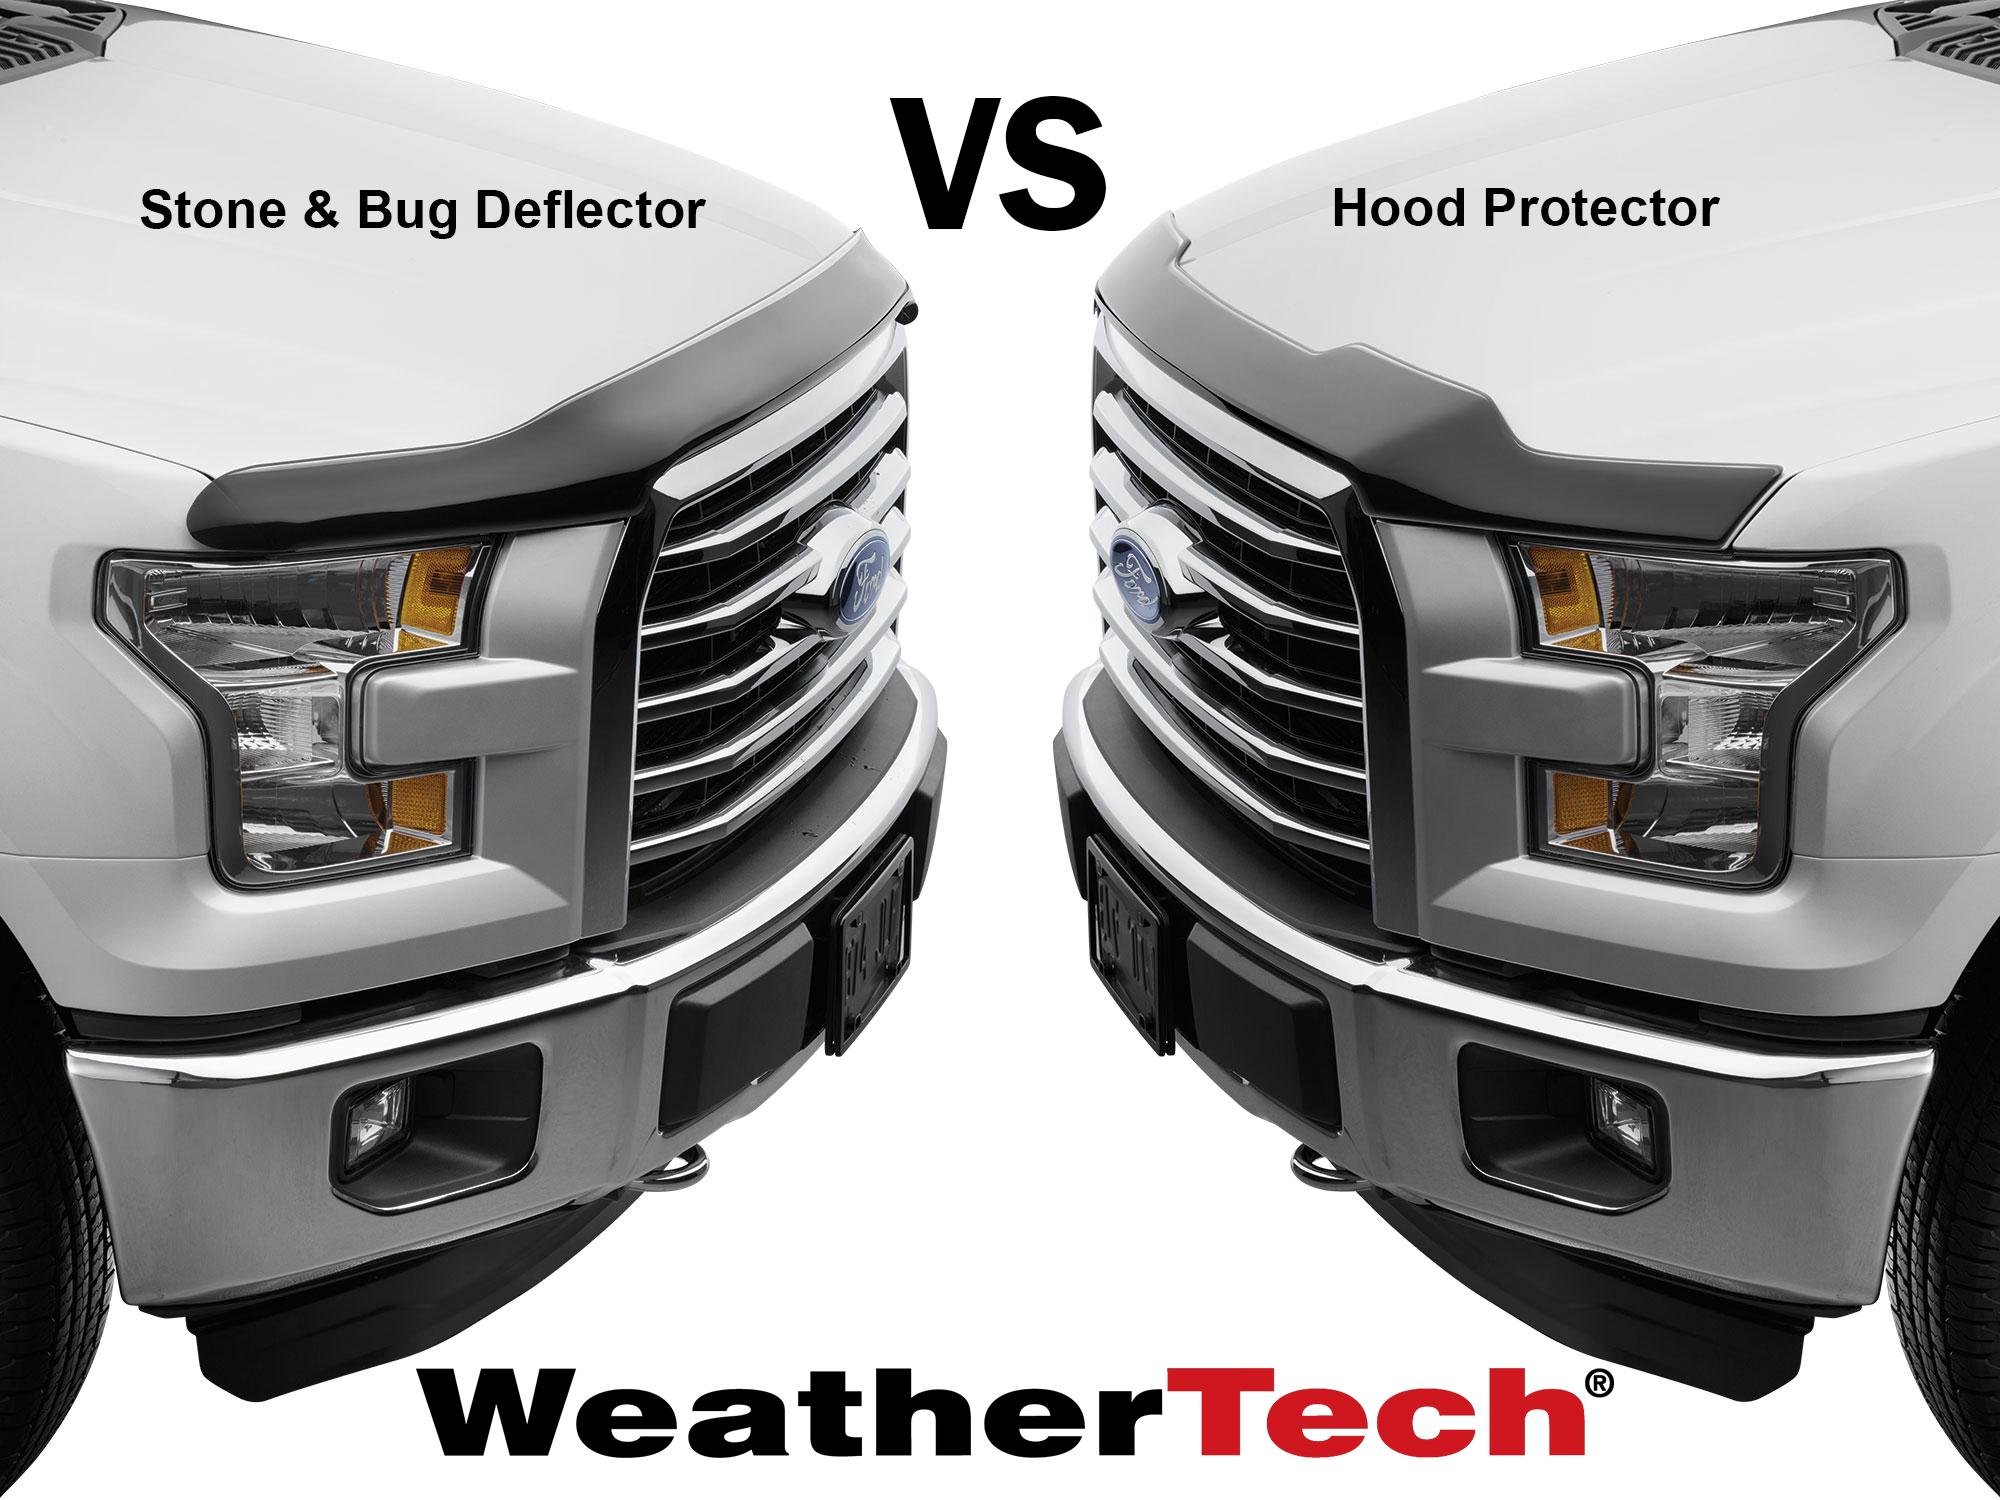 Stone & Bug Deflector vs. Hood Protector